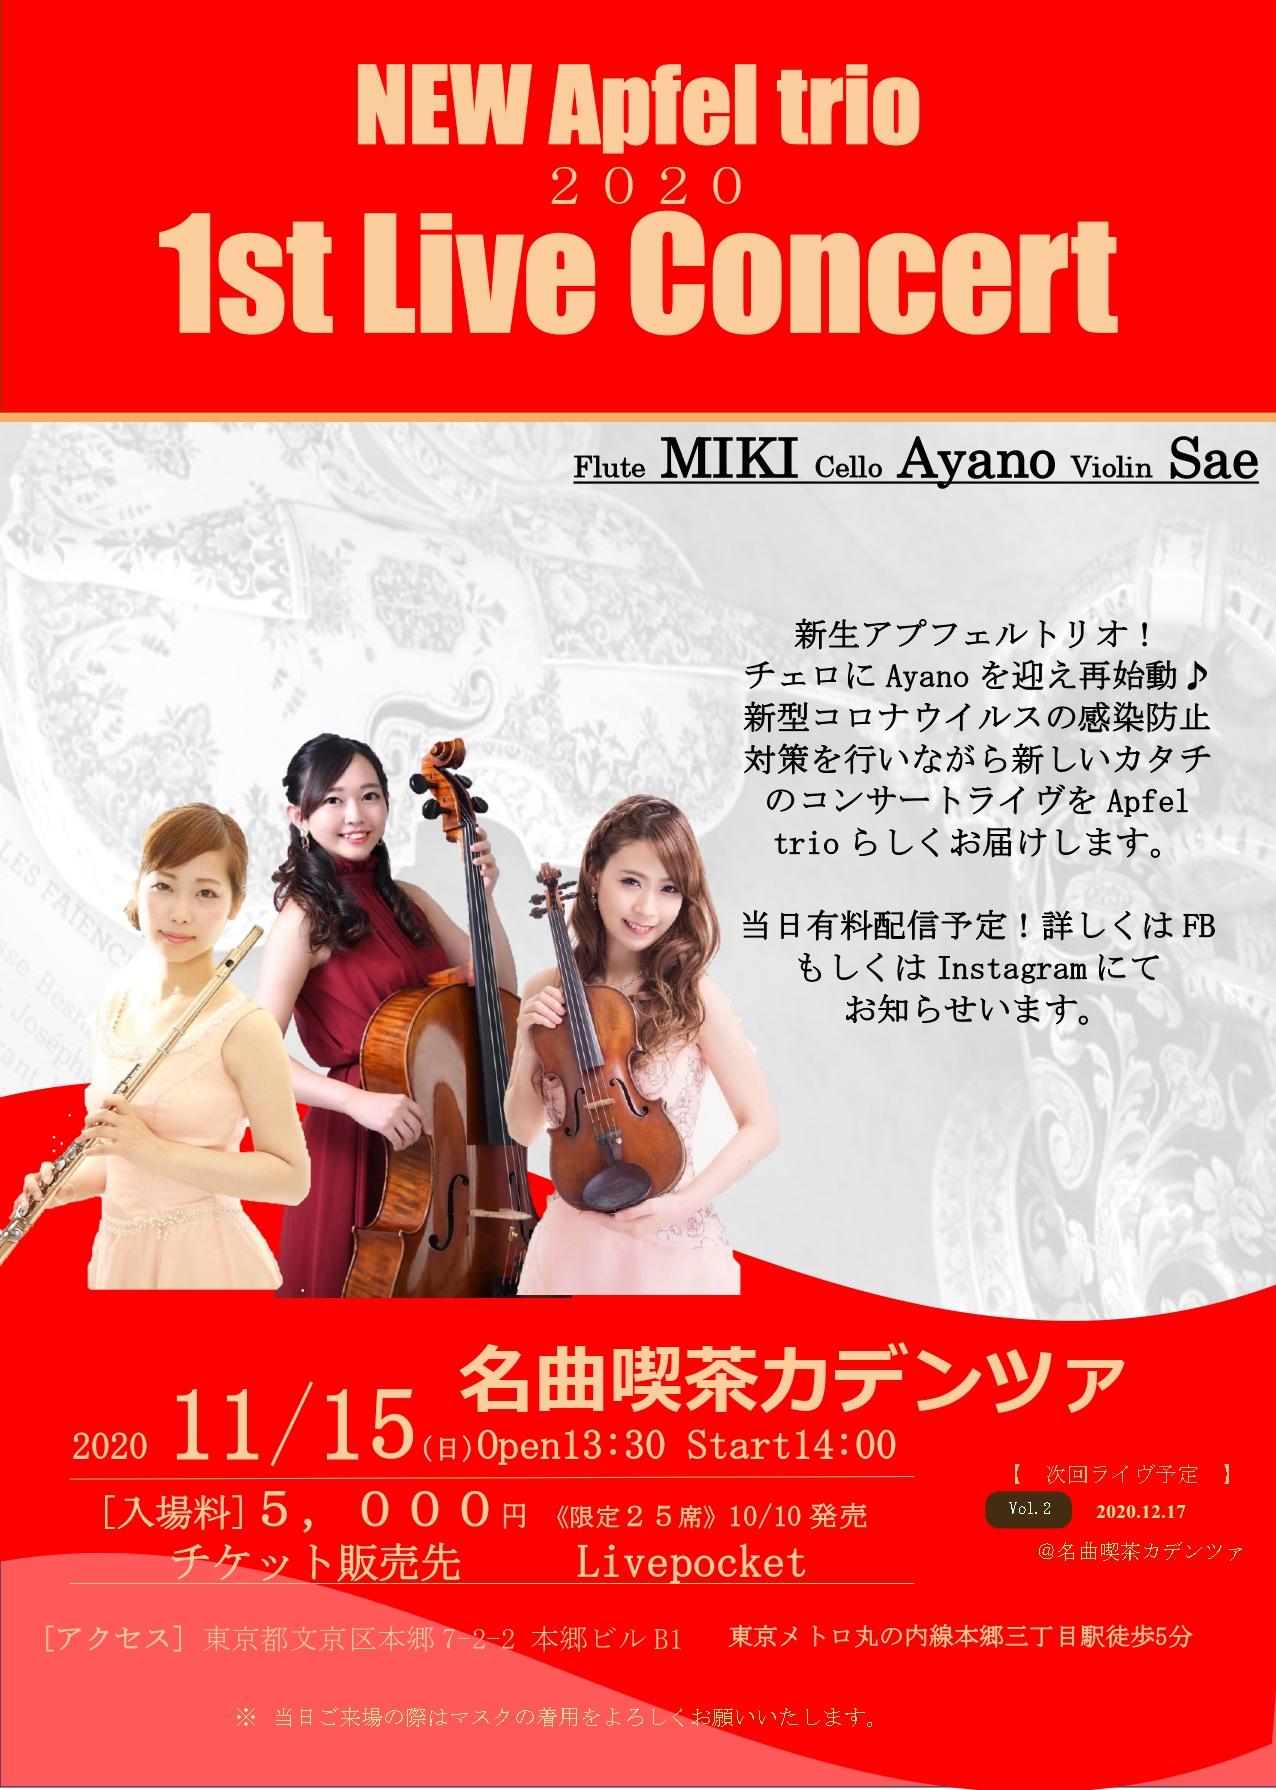 new Apfel trio 1st Live Concert